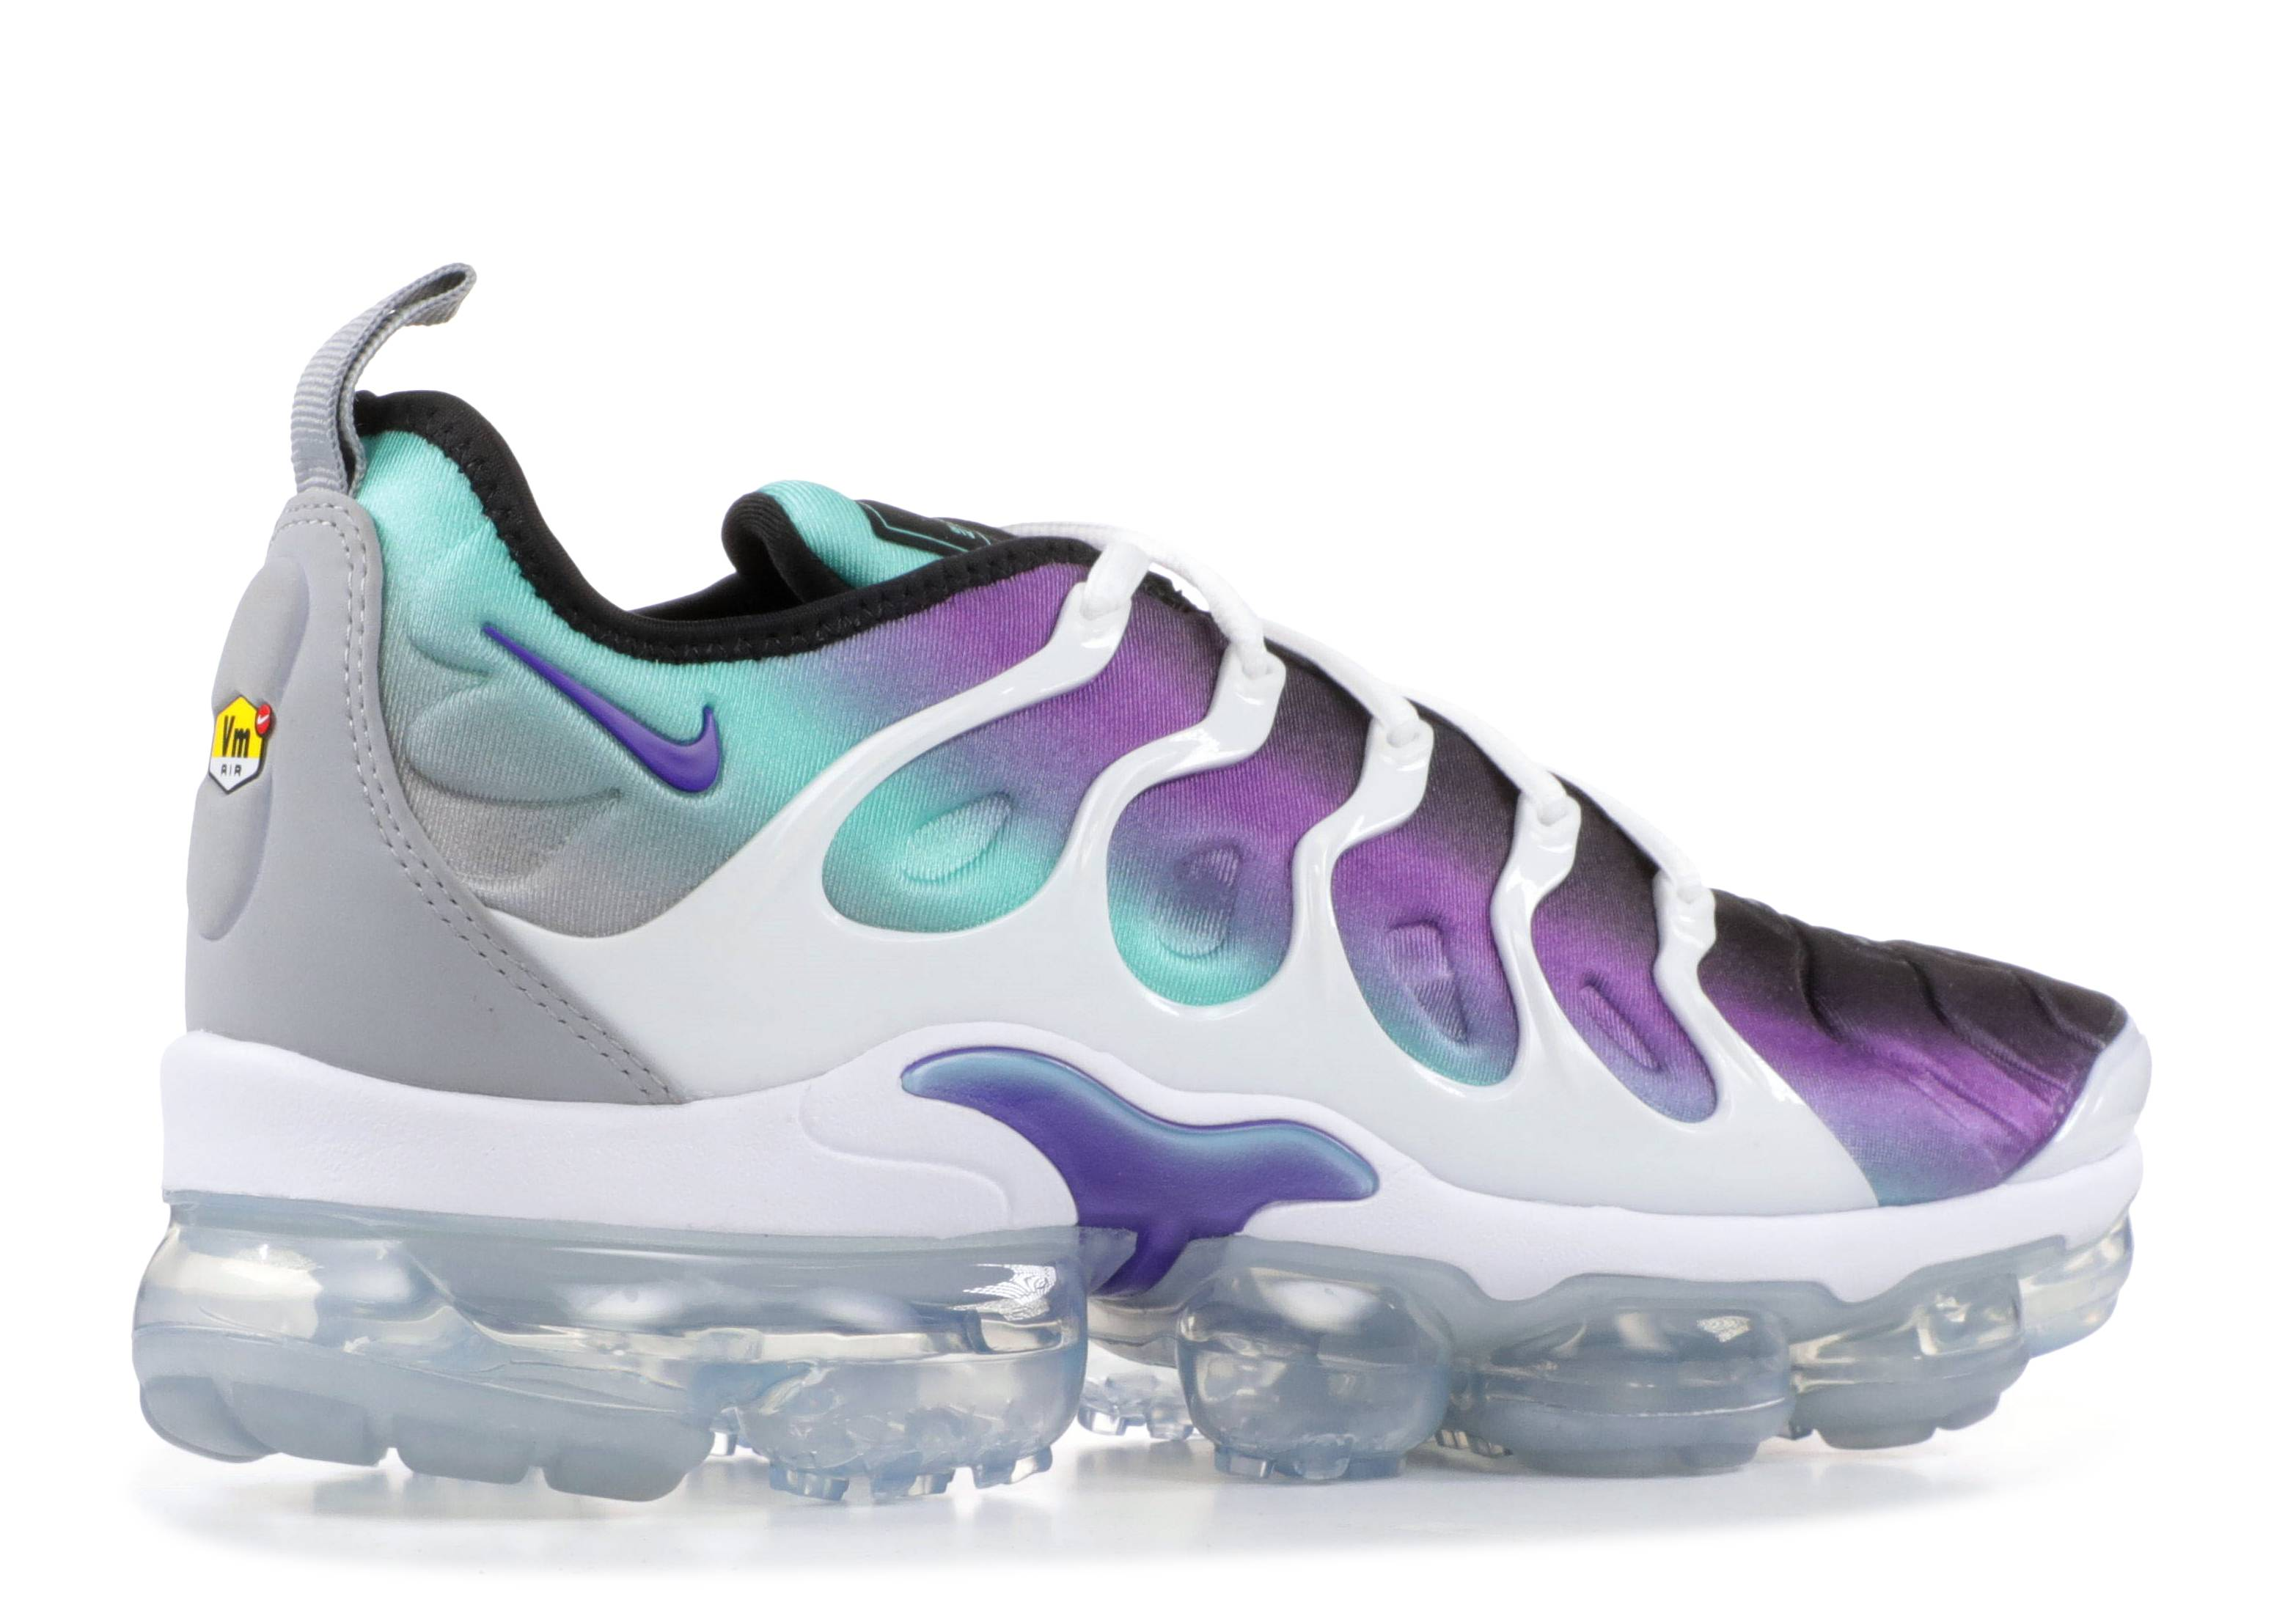 f443c39618 Air Vapormax Plus - Nike - 924453 101 - white/fierce purple | Flight Club